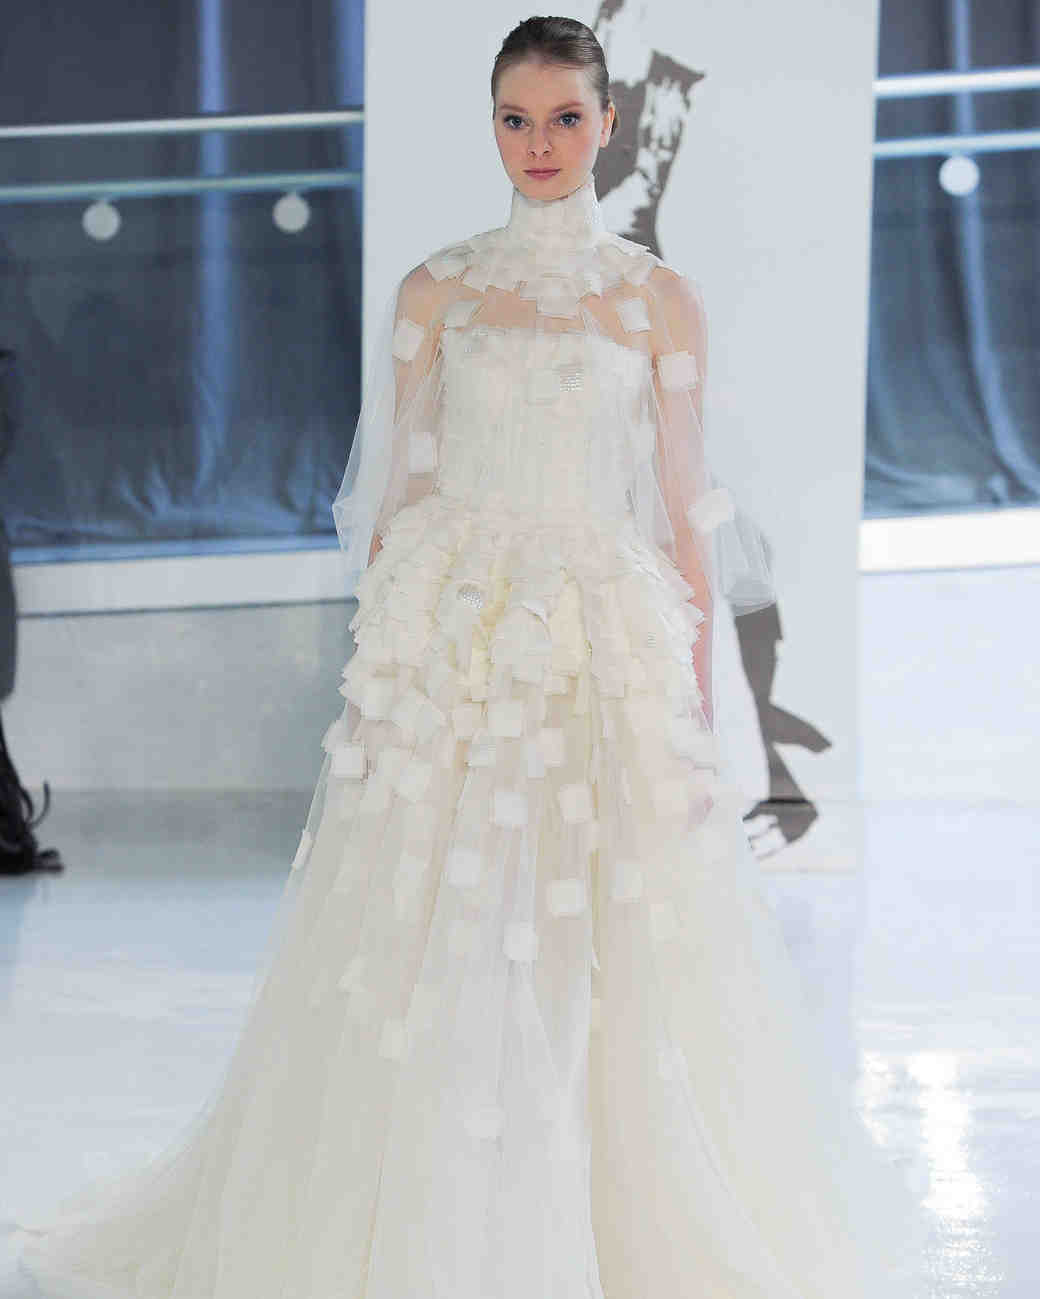 d0f0dd817 نبذة عن بيتر لانغير بيتر لانغير هو مصمم أزياء إيطالي موهوب، خاصة في تصاميم  فساتين